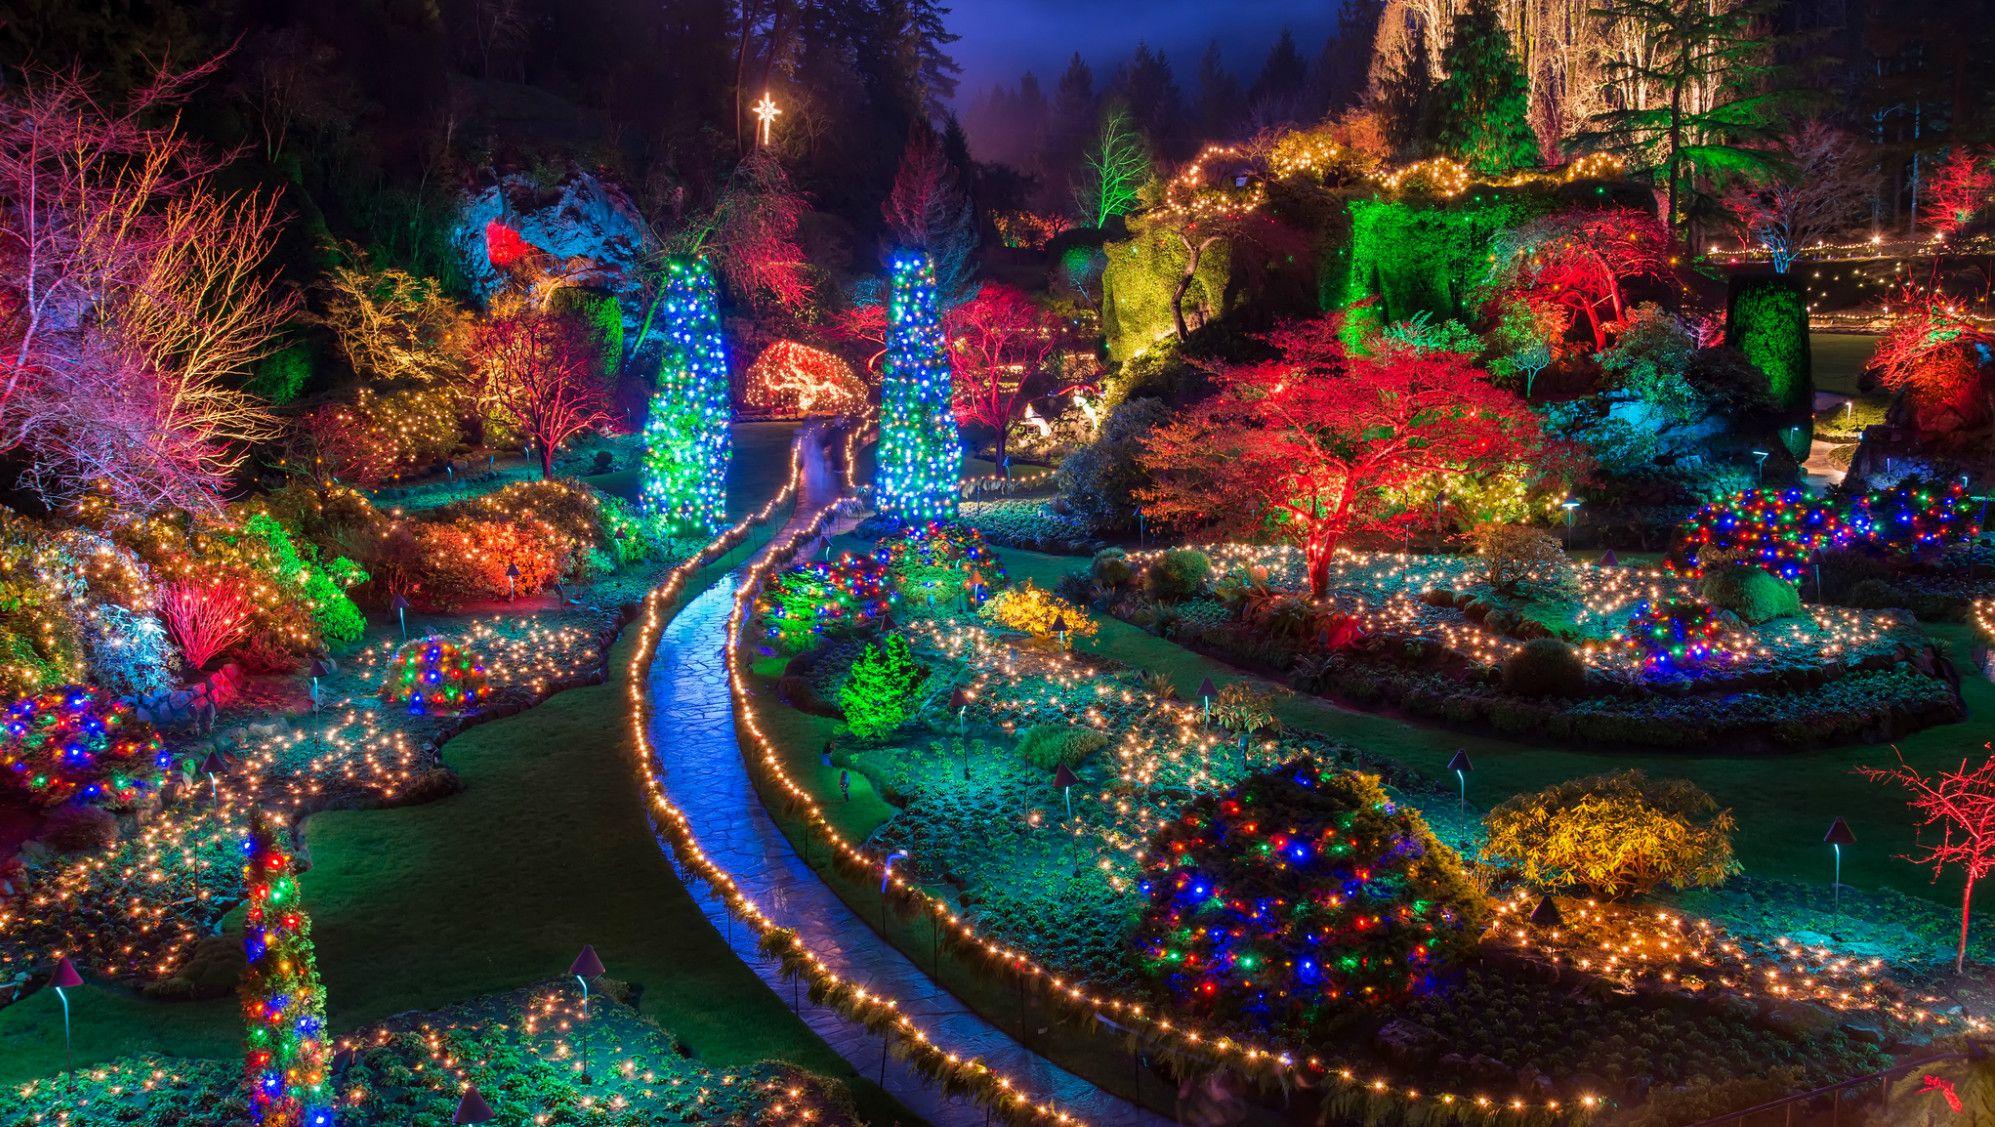 The Magic Of Christmas At Butchart Gardens #butchartgardens